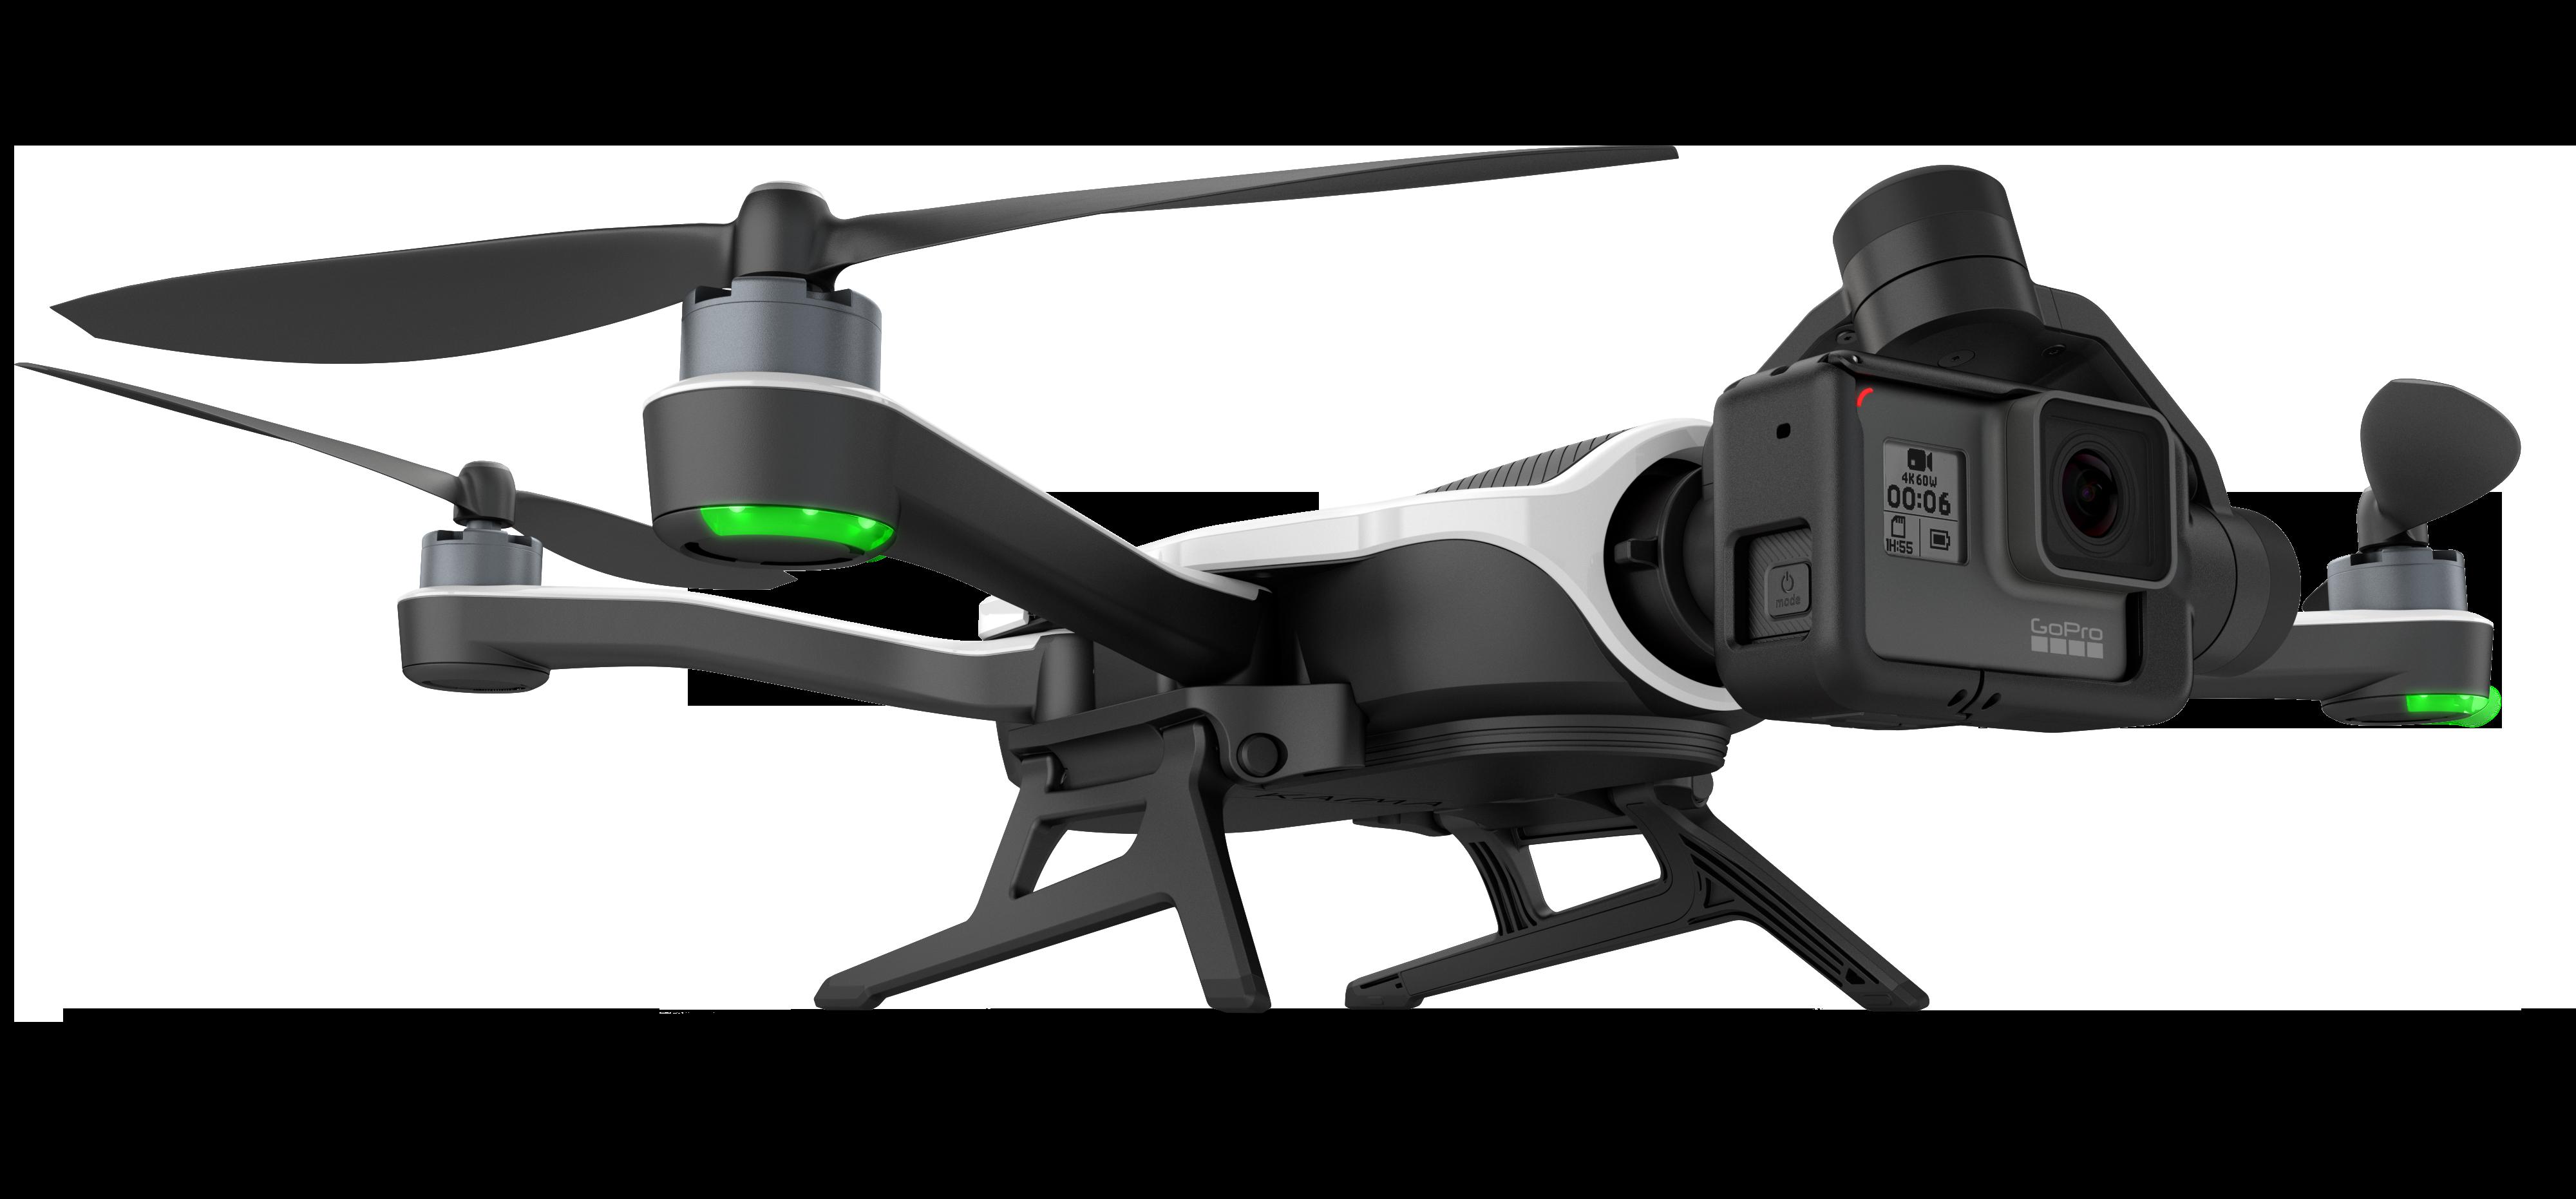 clip free download drone transparent simple #95982290